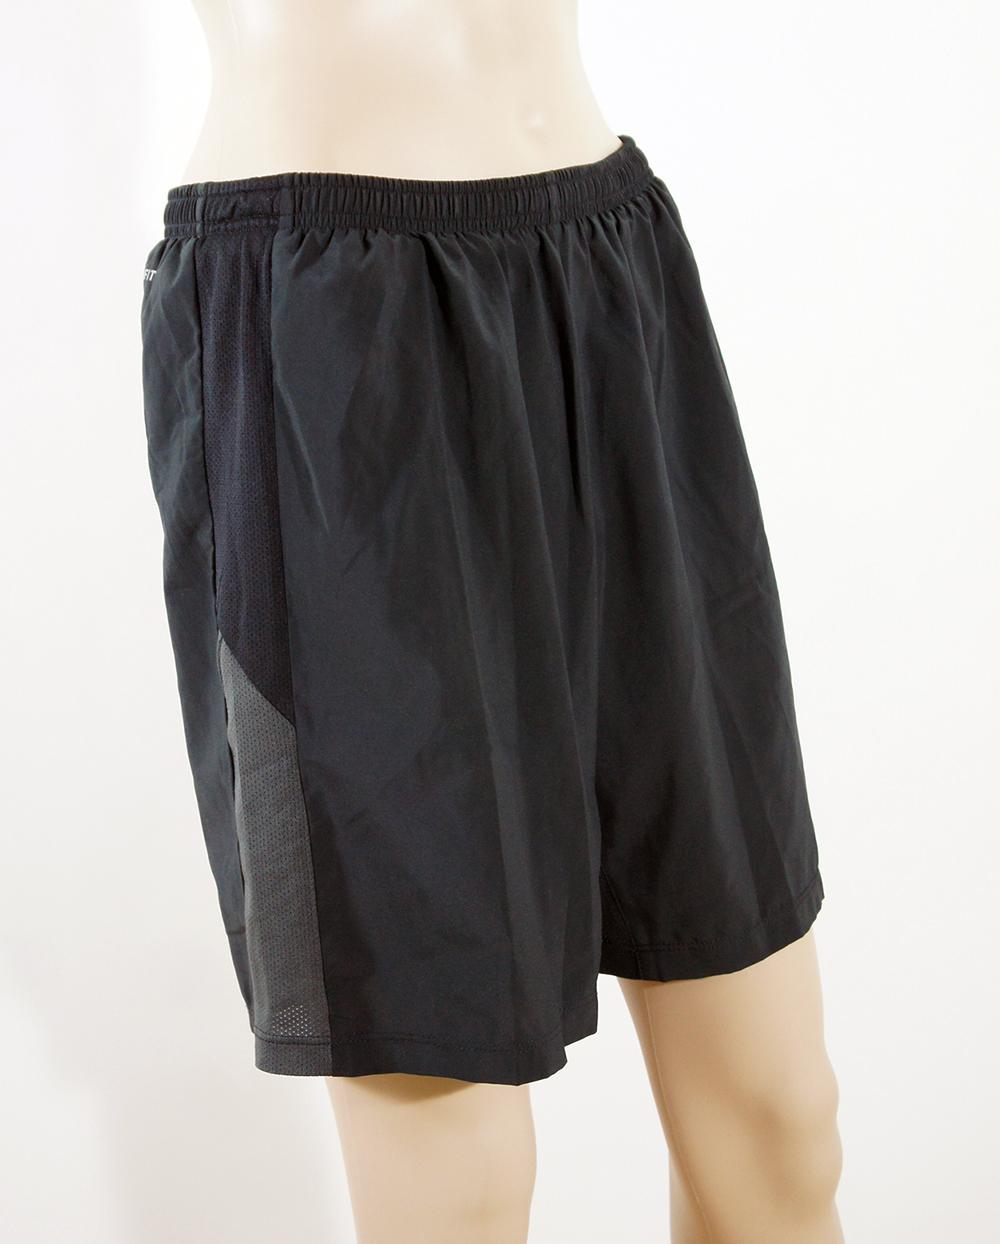 nike sporthose herren kurz schwarz ebay kleinanzeigen